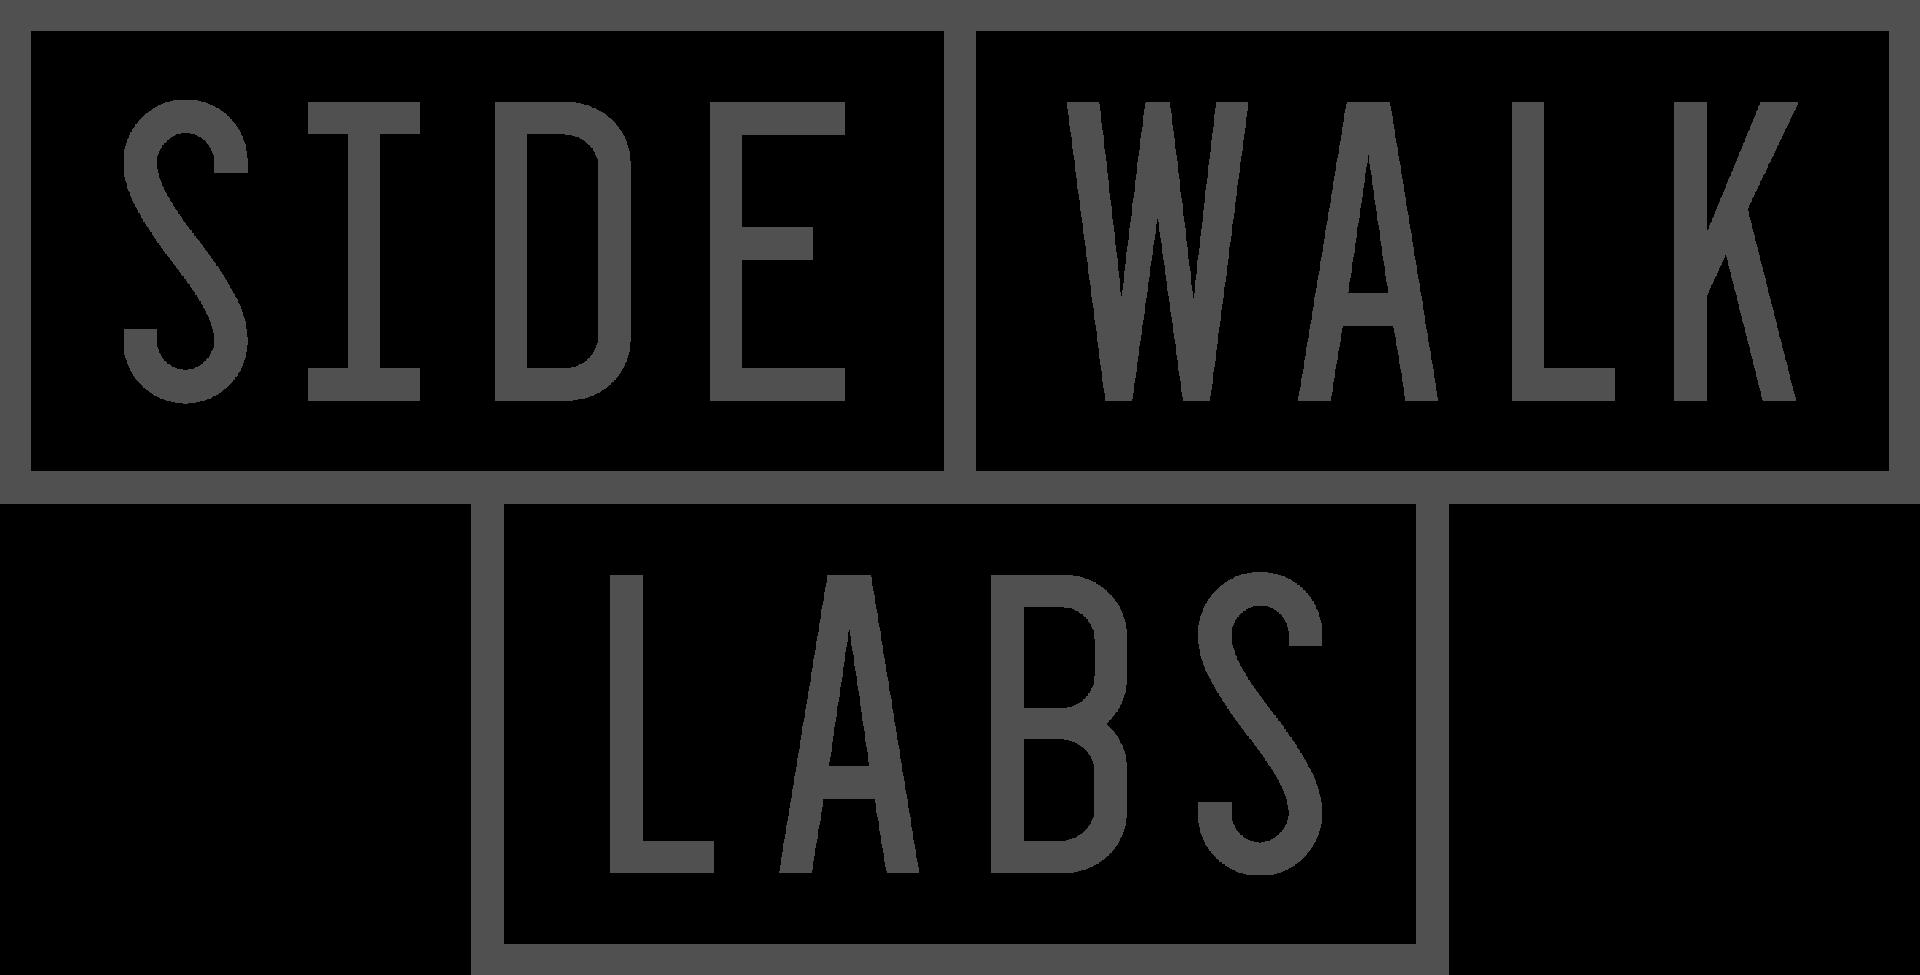 SidewalkLabs_Logo_Center-stacked_Grey